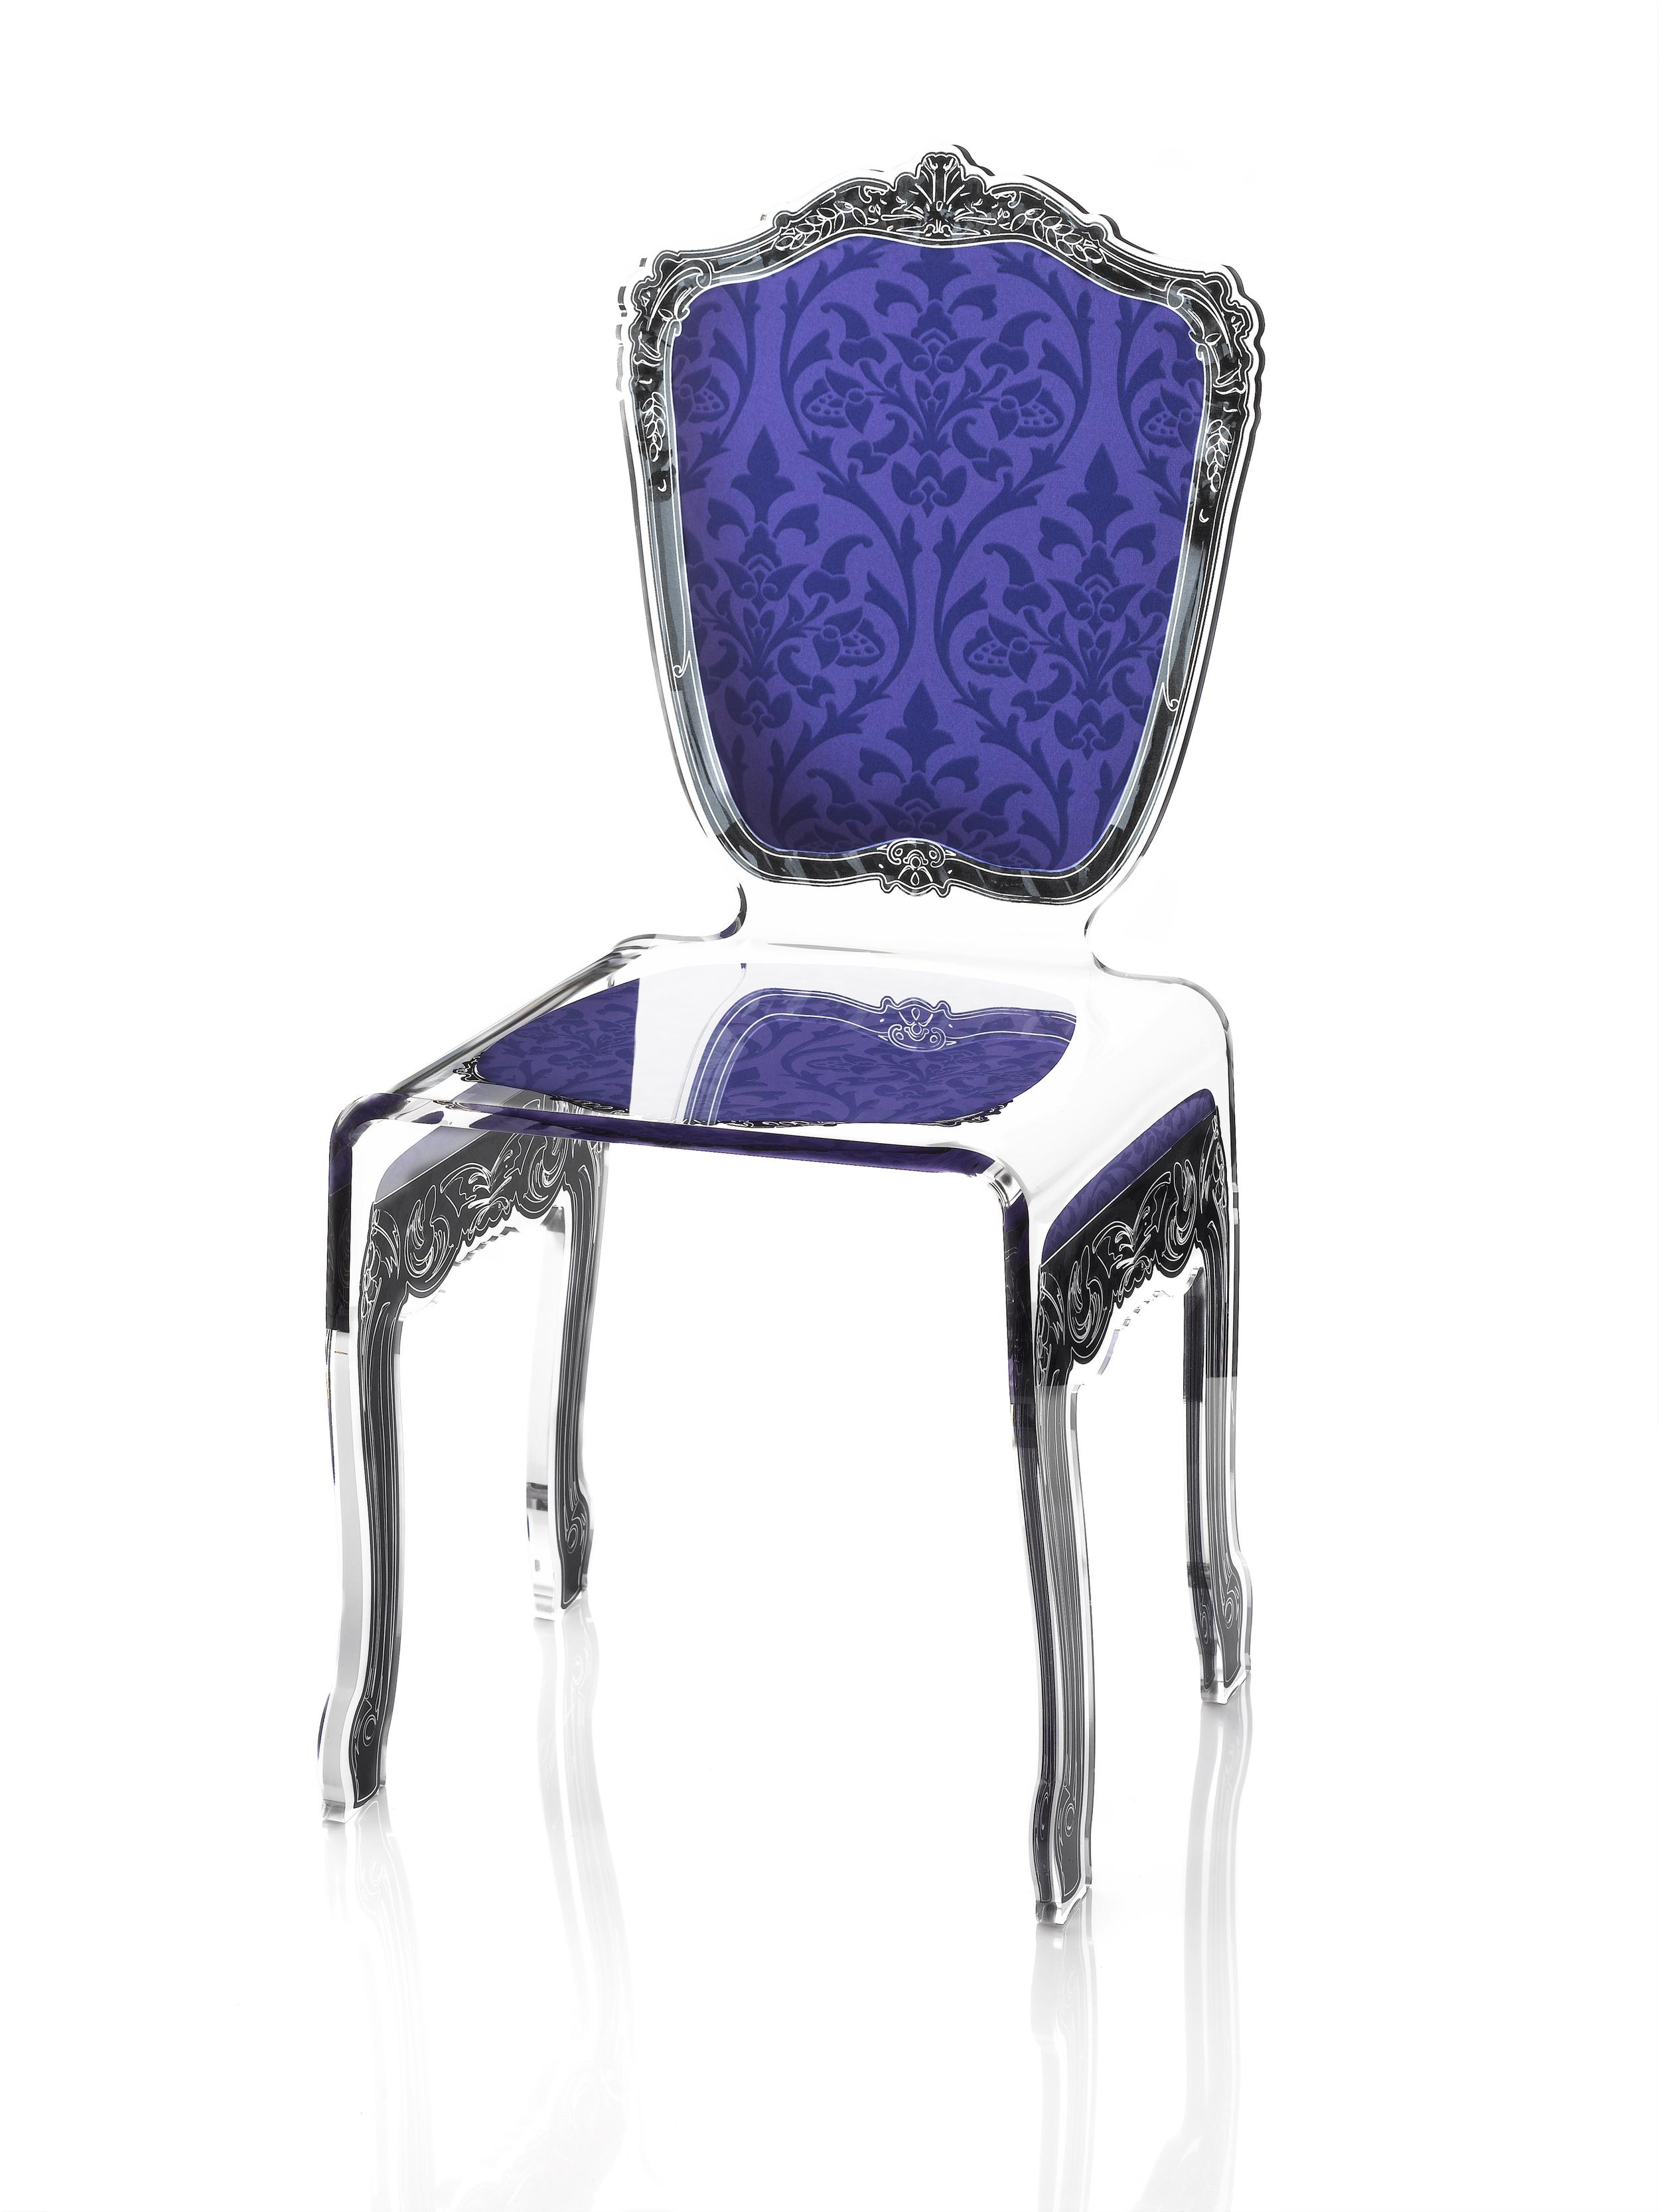 chaise violette.jpg